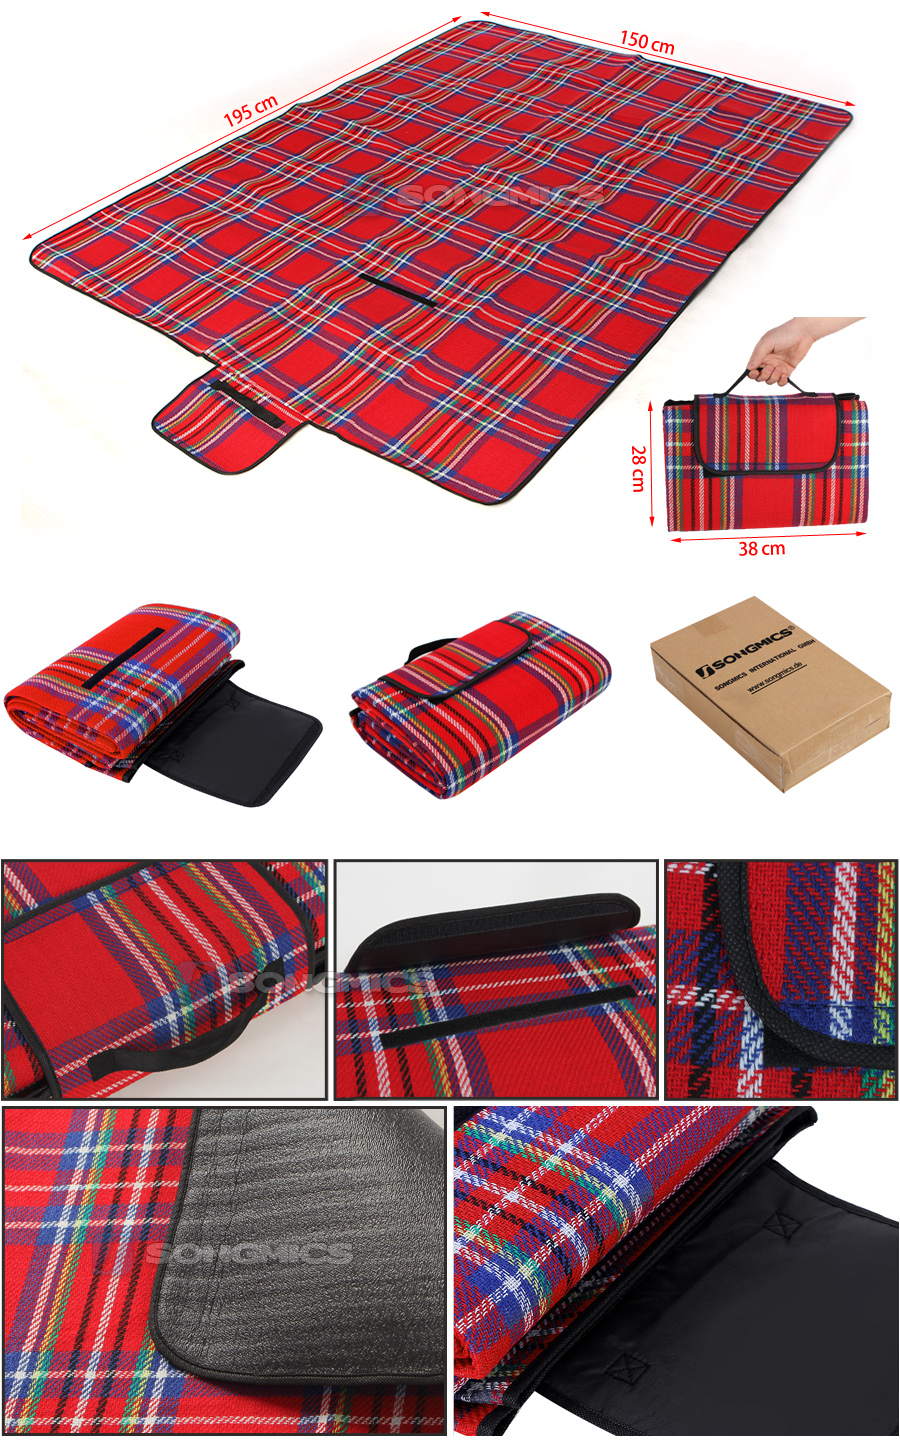 songmics 195 x 150 cm campingdecke picknickdecke stranddecke reisedecke gcm50r ebay. Black Bedroom Furniture Sets. Home Design Ideas